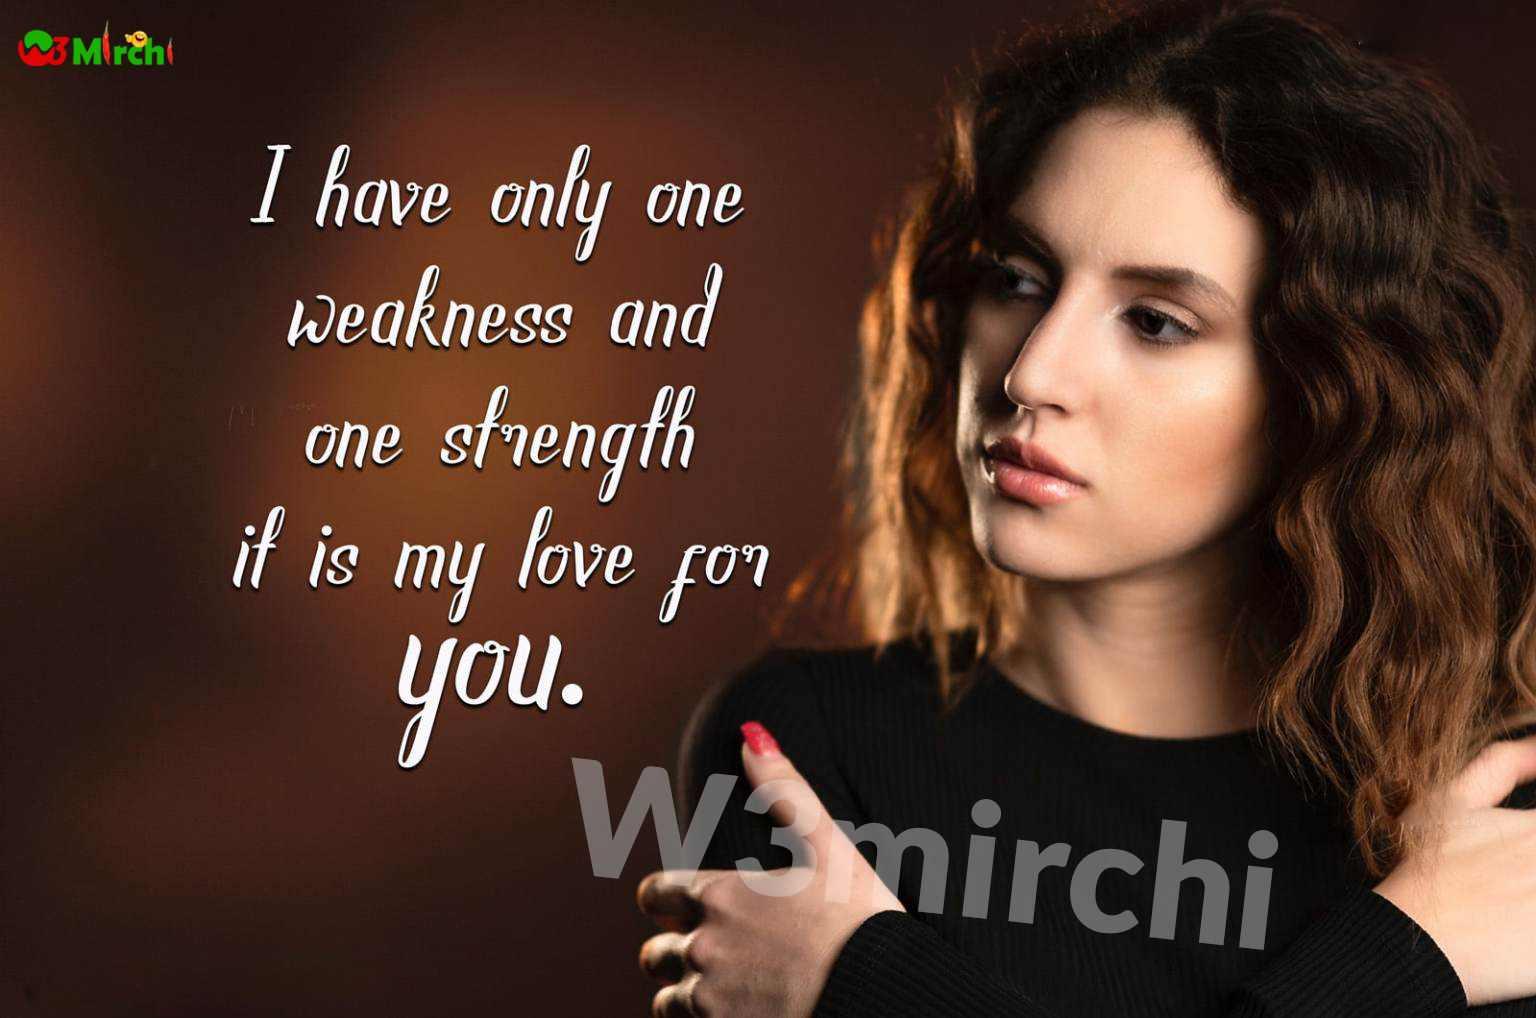 Weakness Quotes (कमजोरी कोट्स)